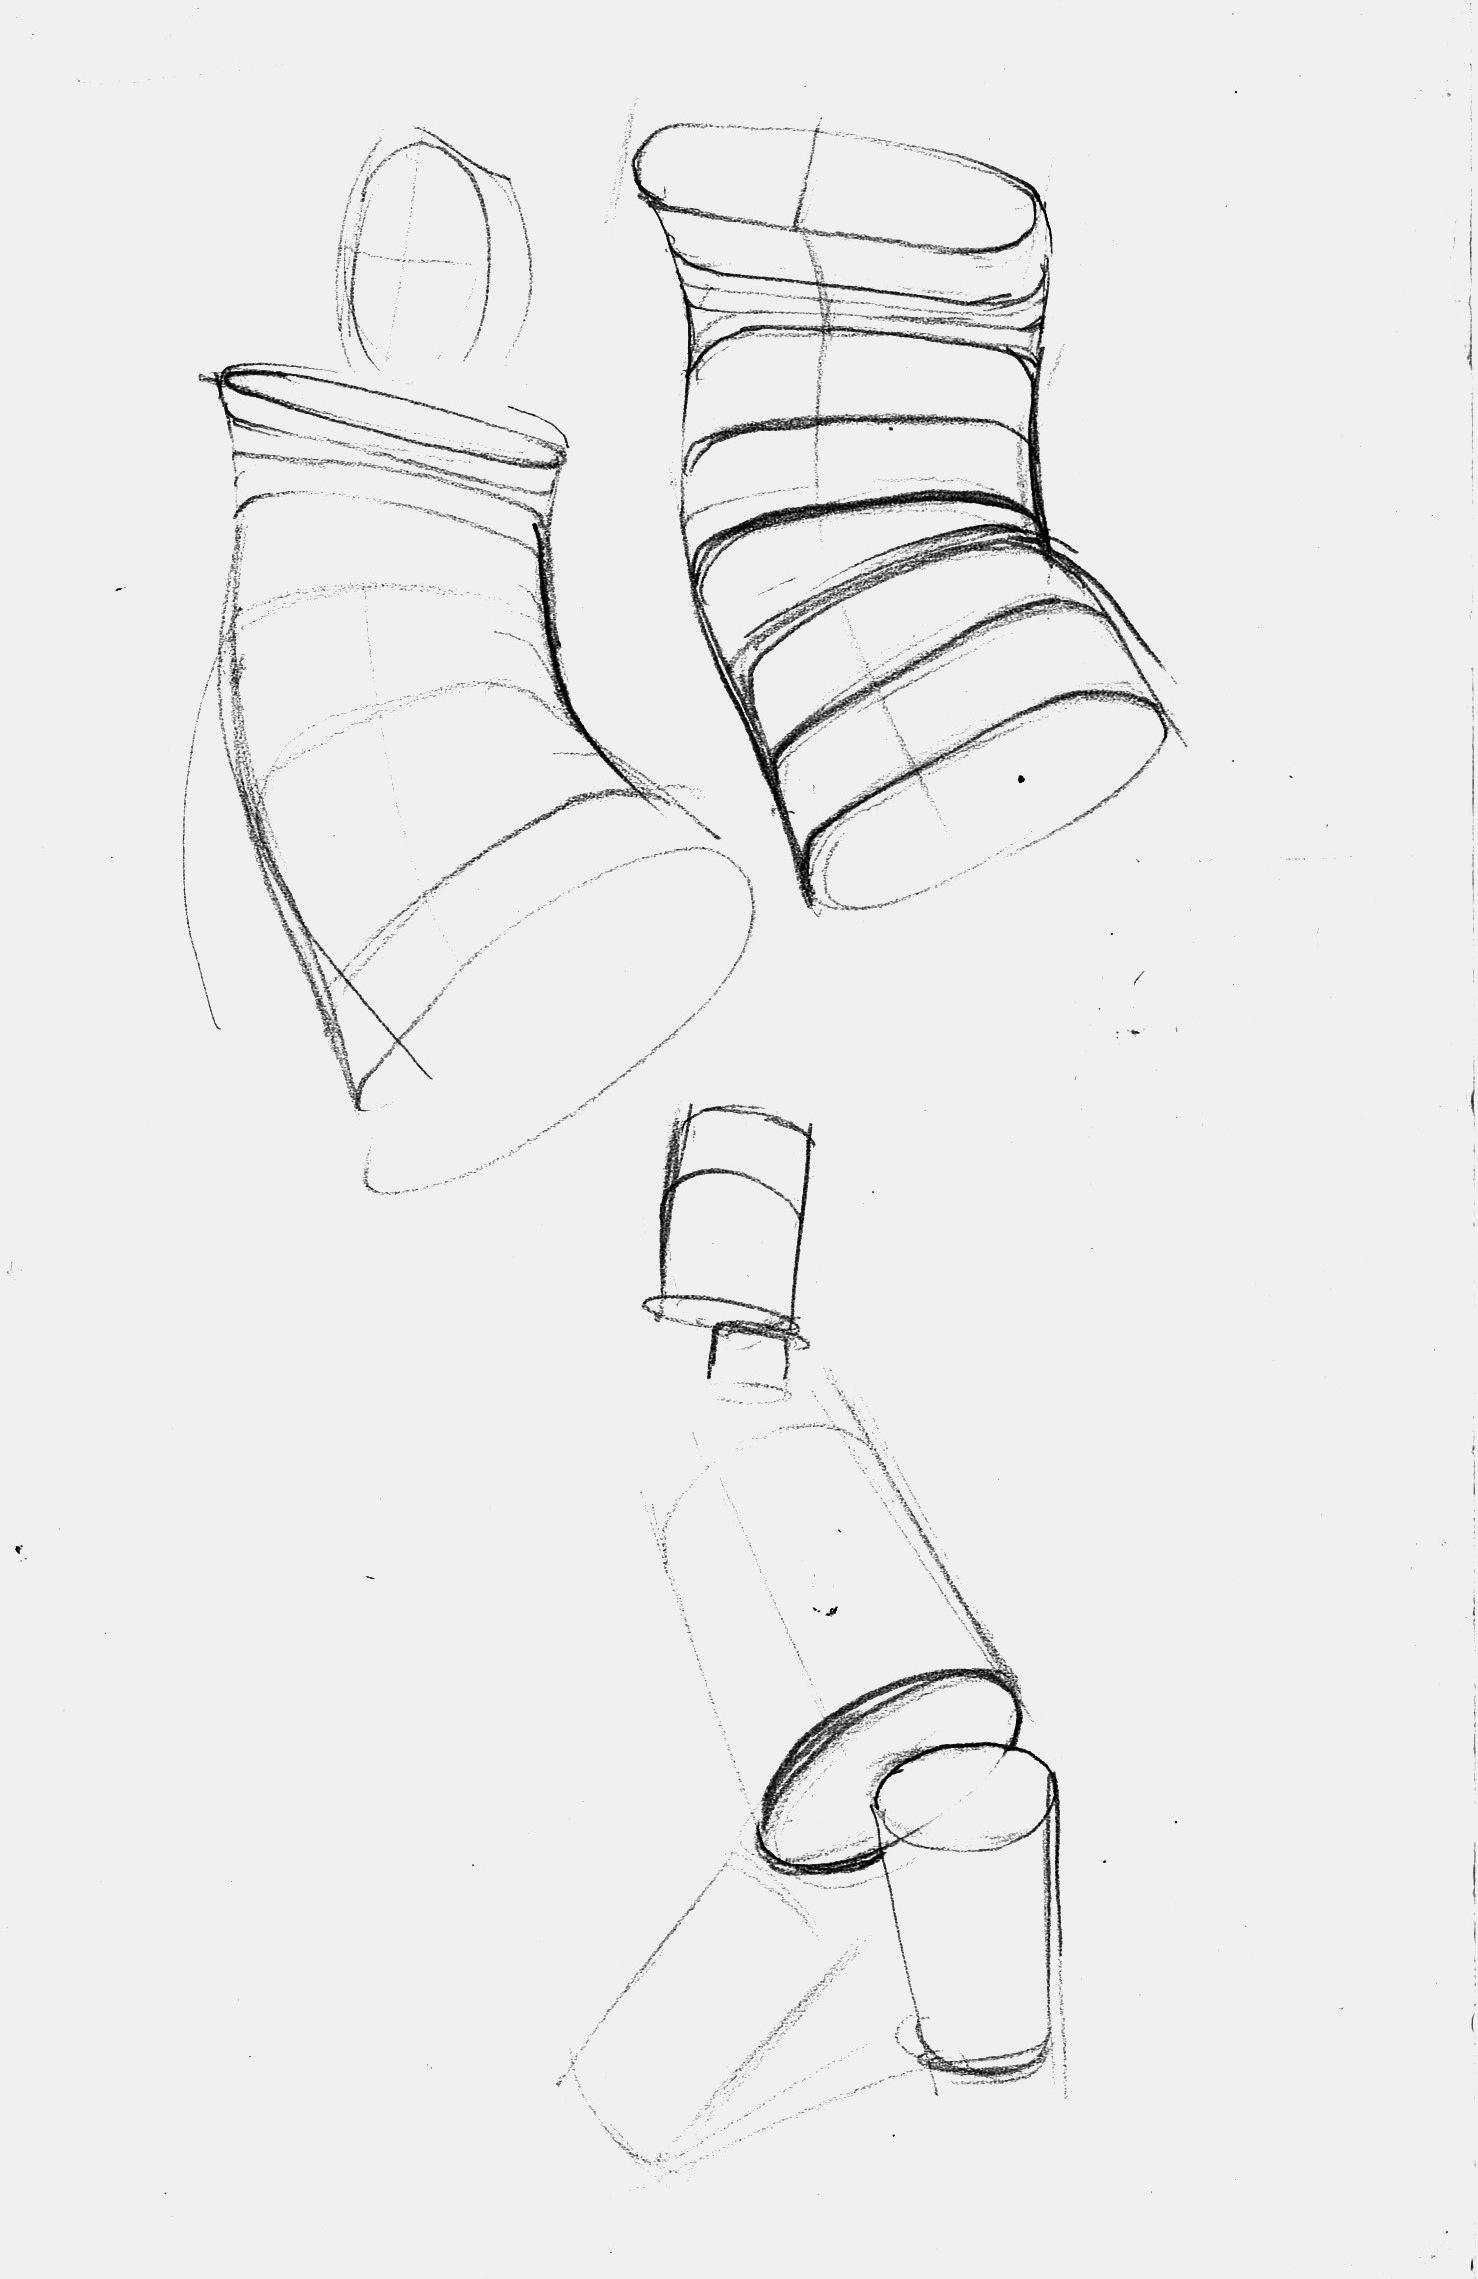 basic form drawing scans 2.jpeg